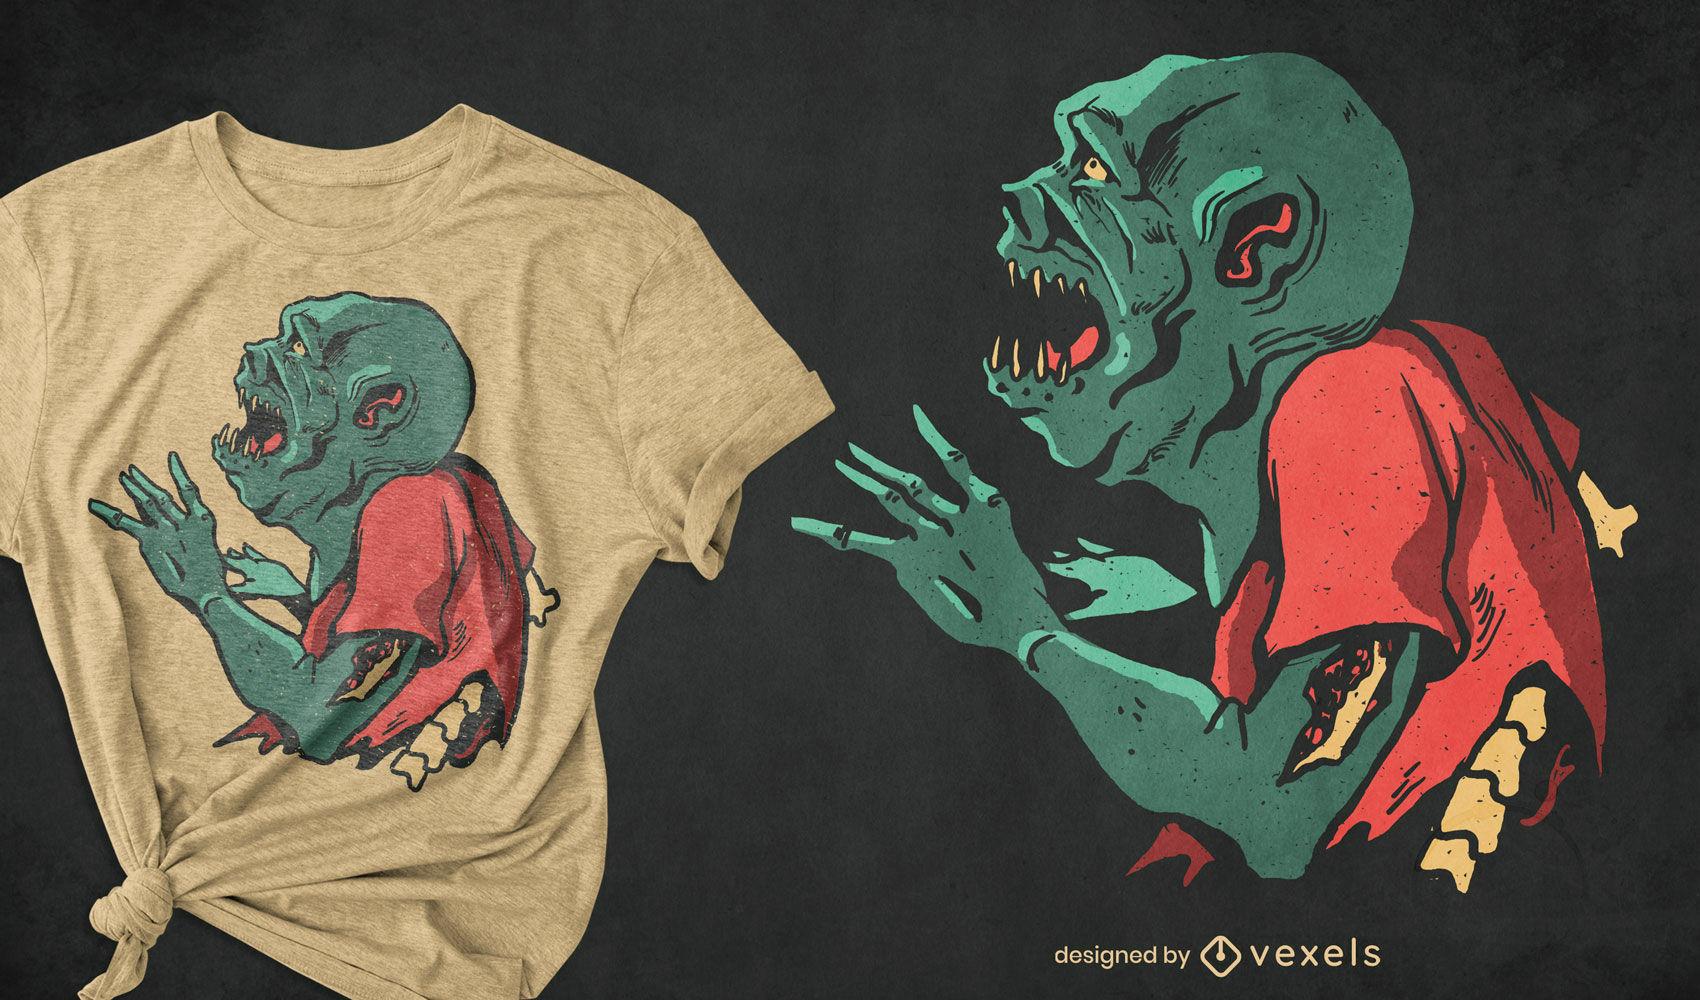 Design de camiseta assustadora com monstro verde zumbi